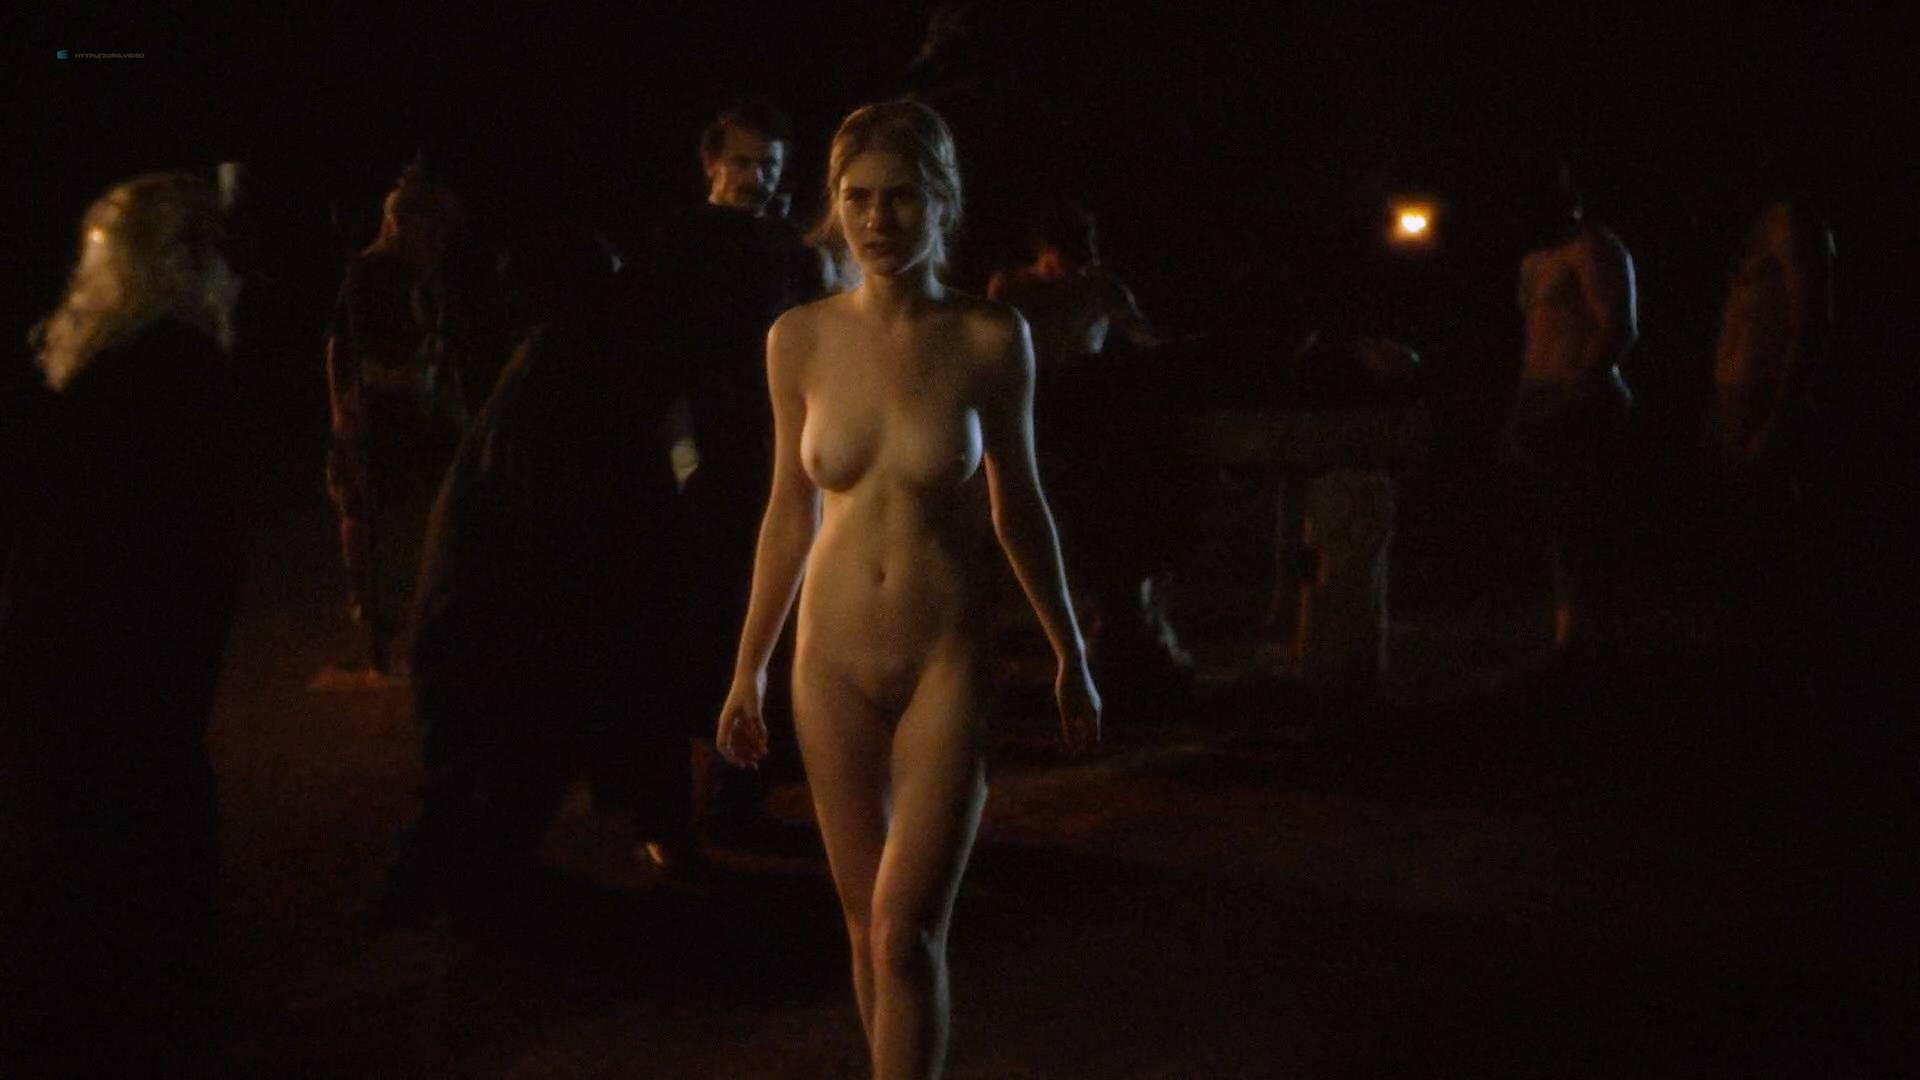 taylor hanson full frontal nude